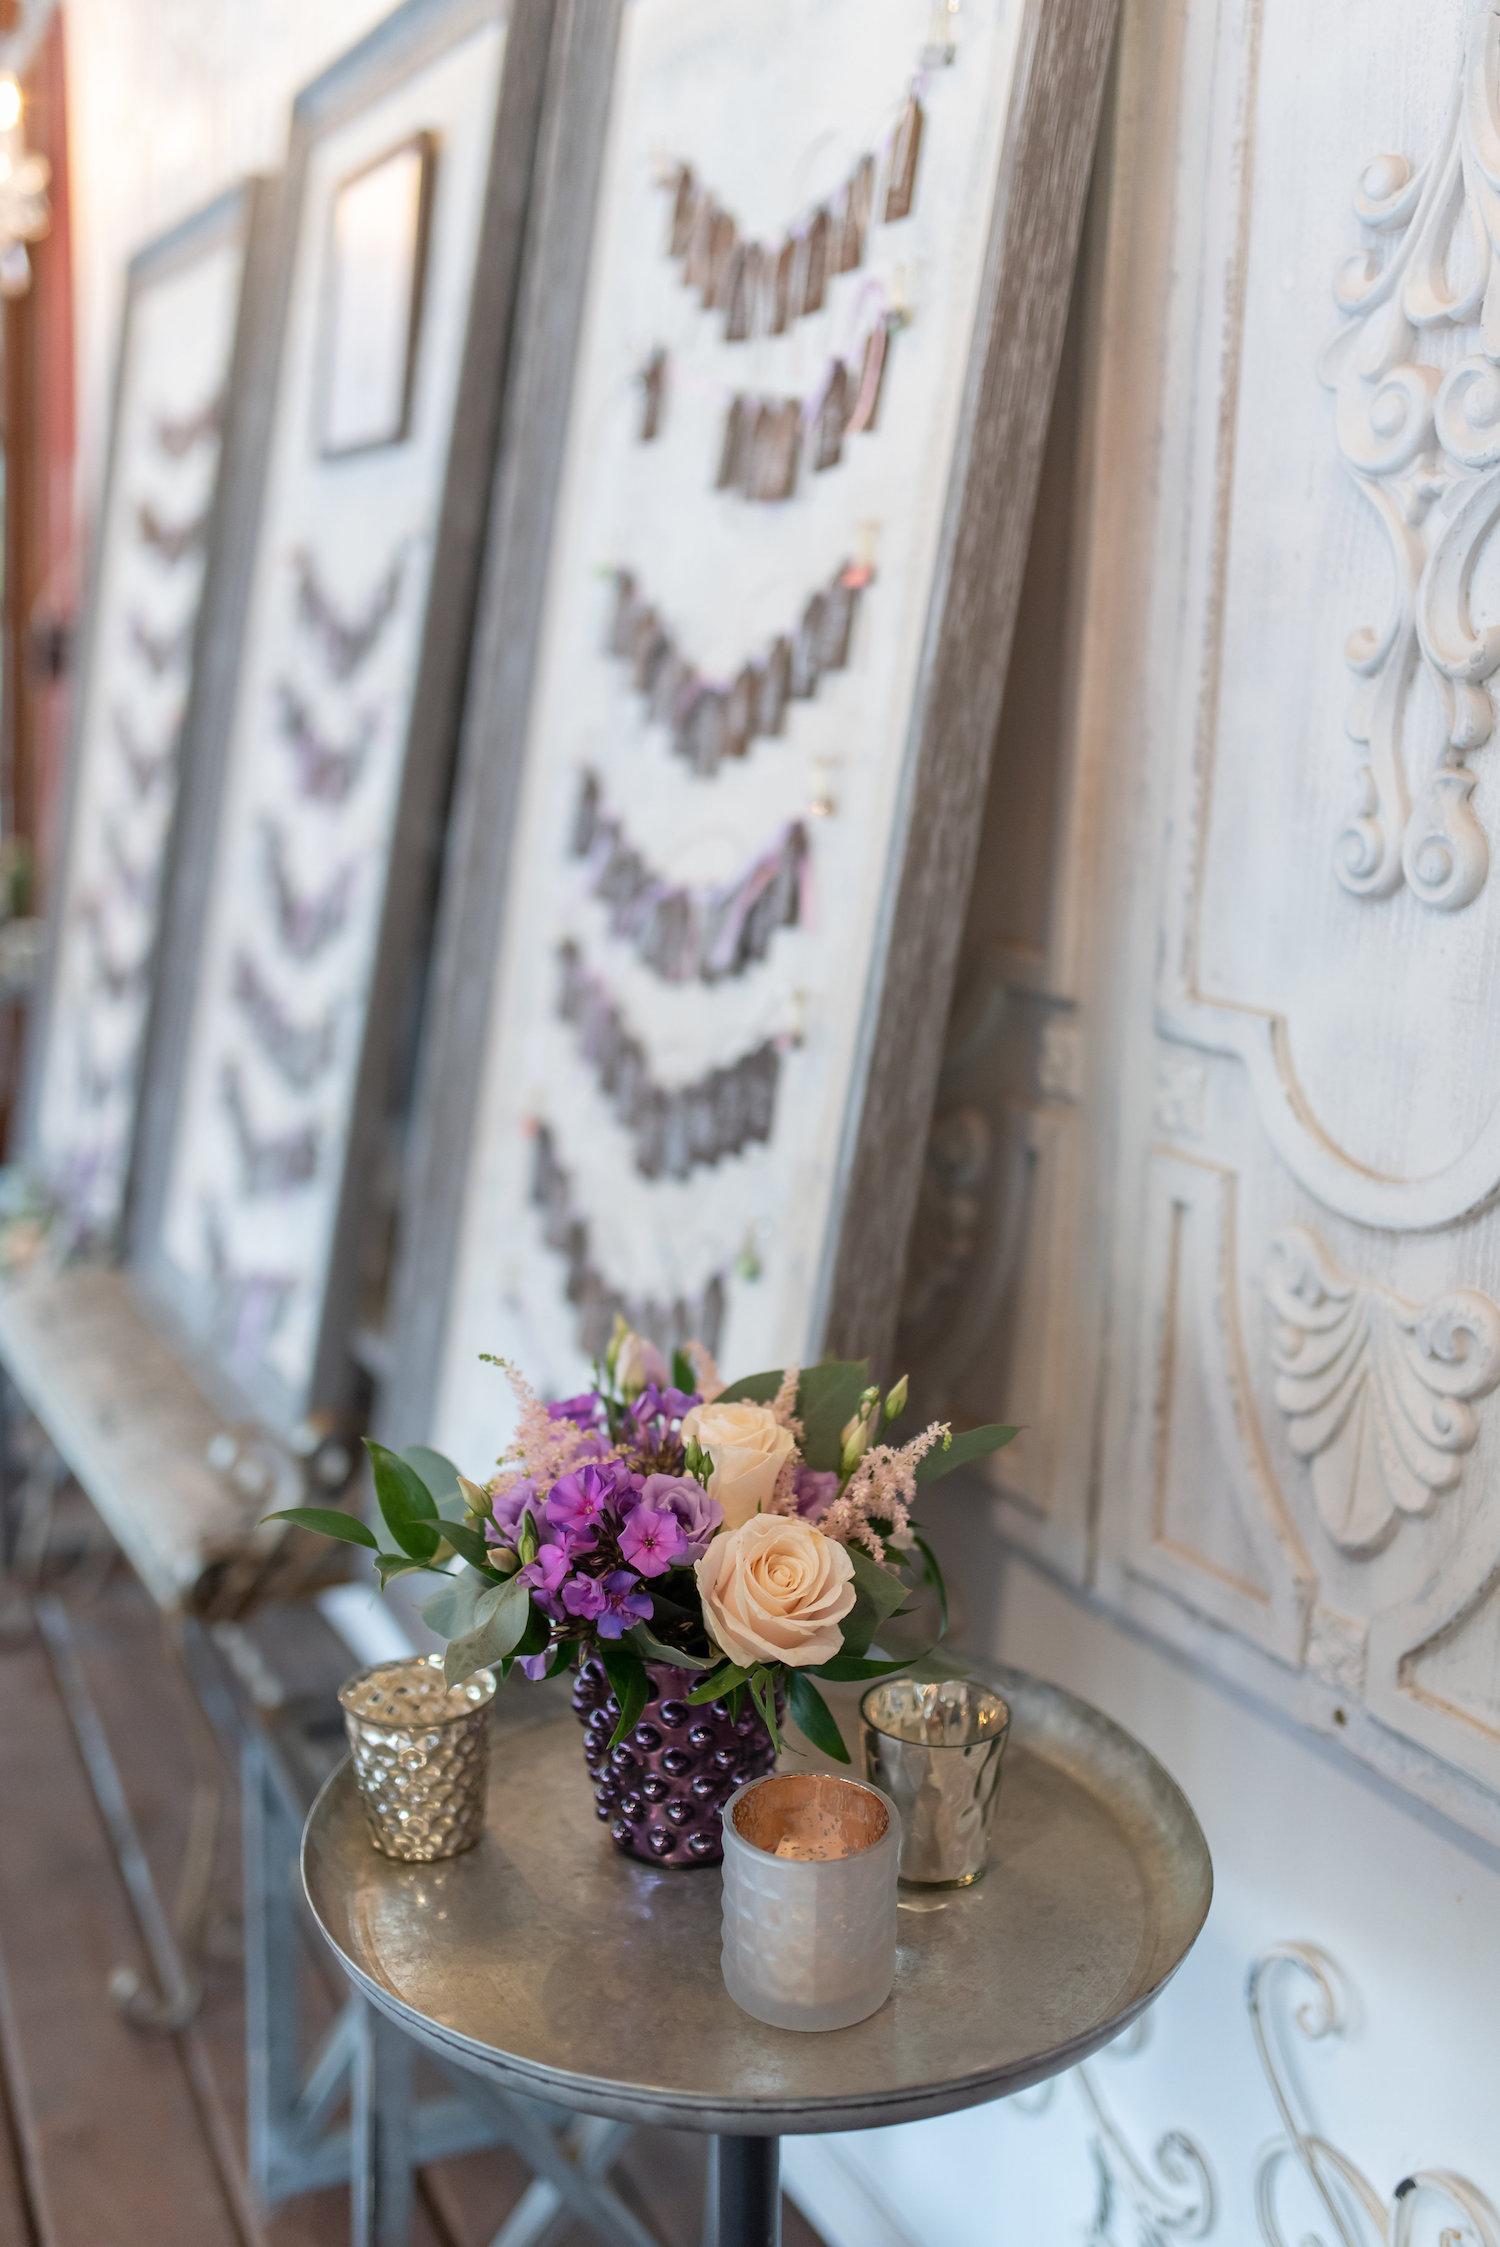 Sarah and Mark | Hope Glen Farm | Kelly Birch Photo | Sixpence Events & Planning wedding planning in Minnesota59.jpg